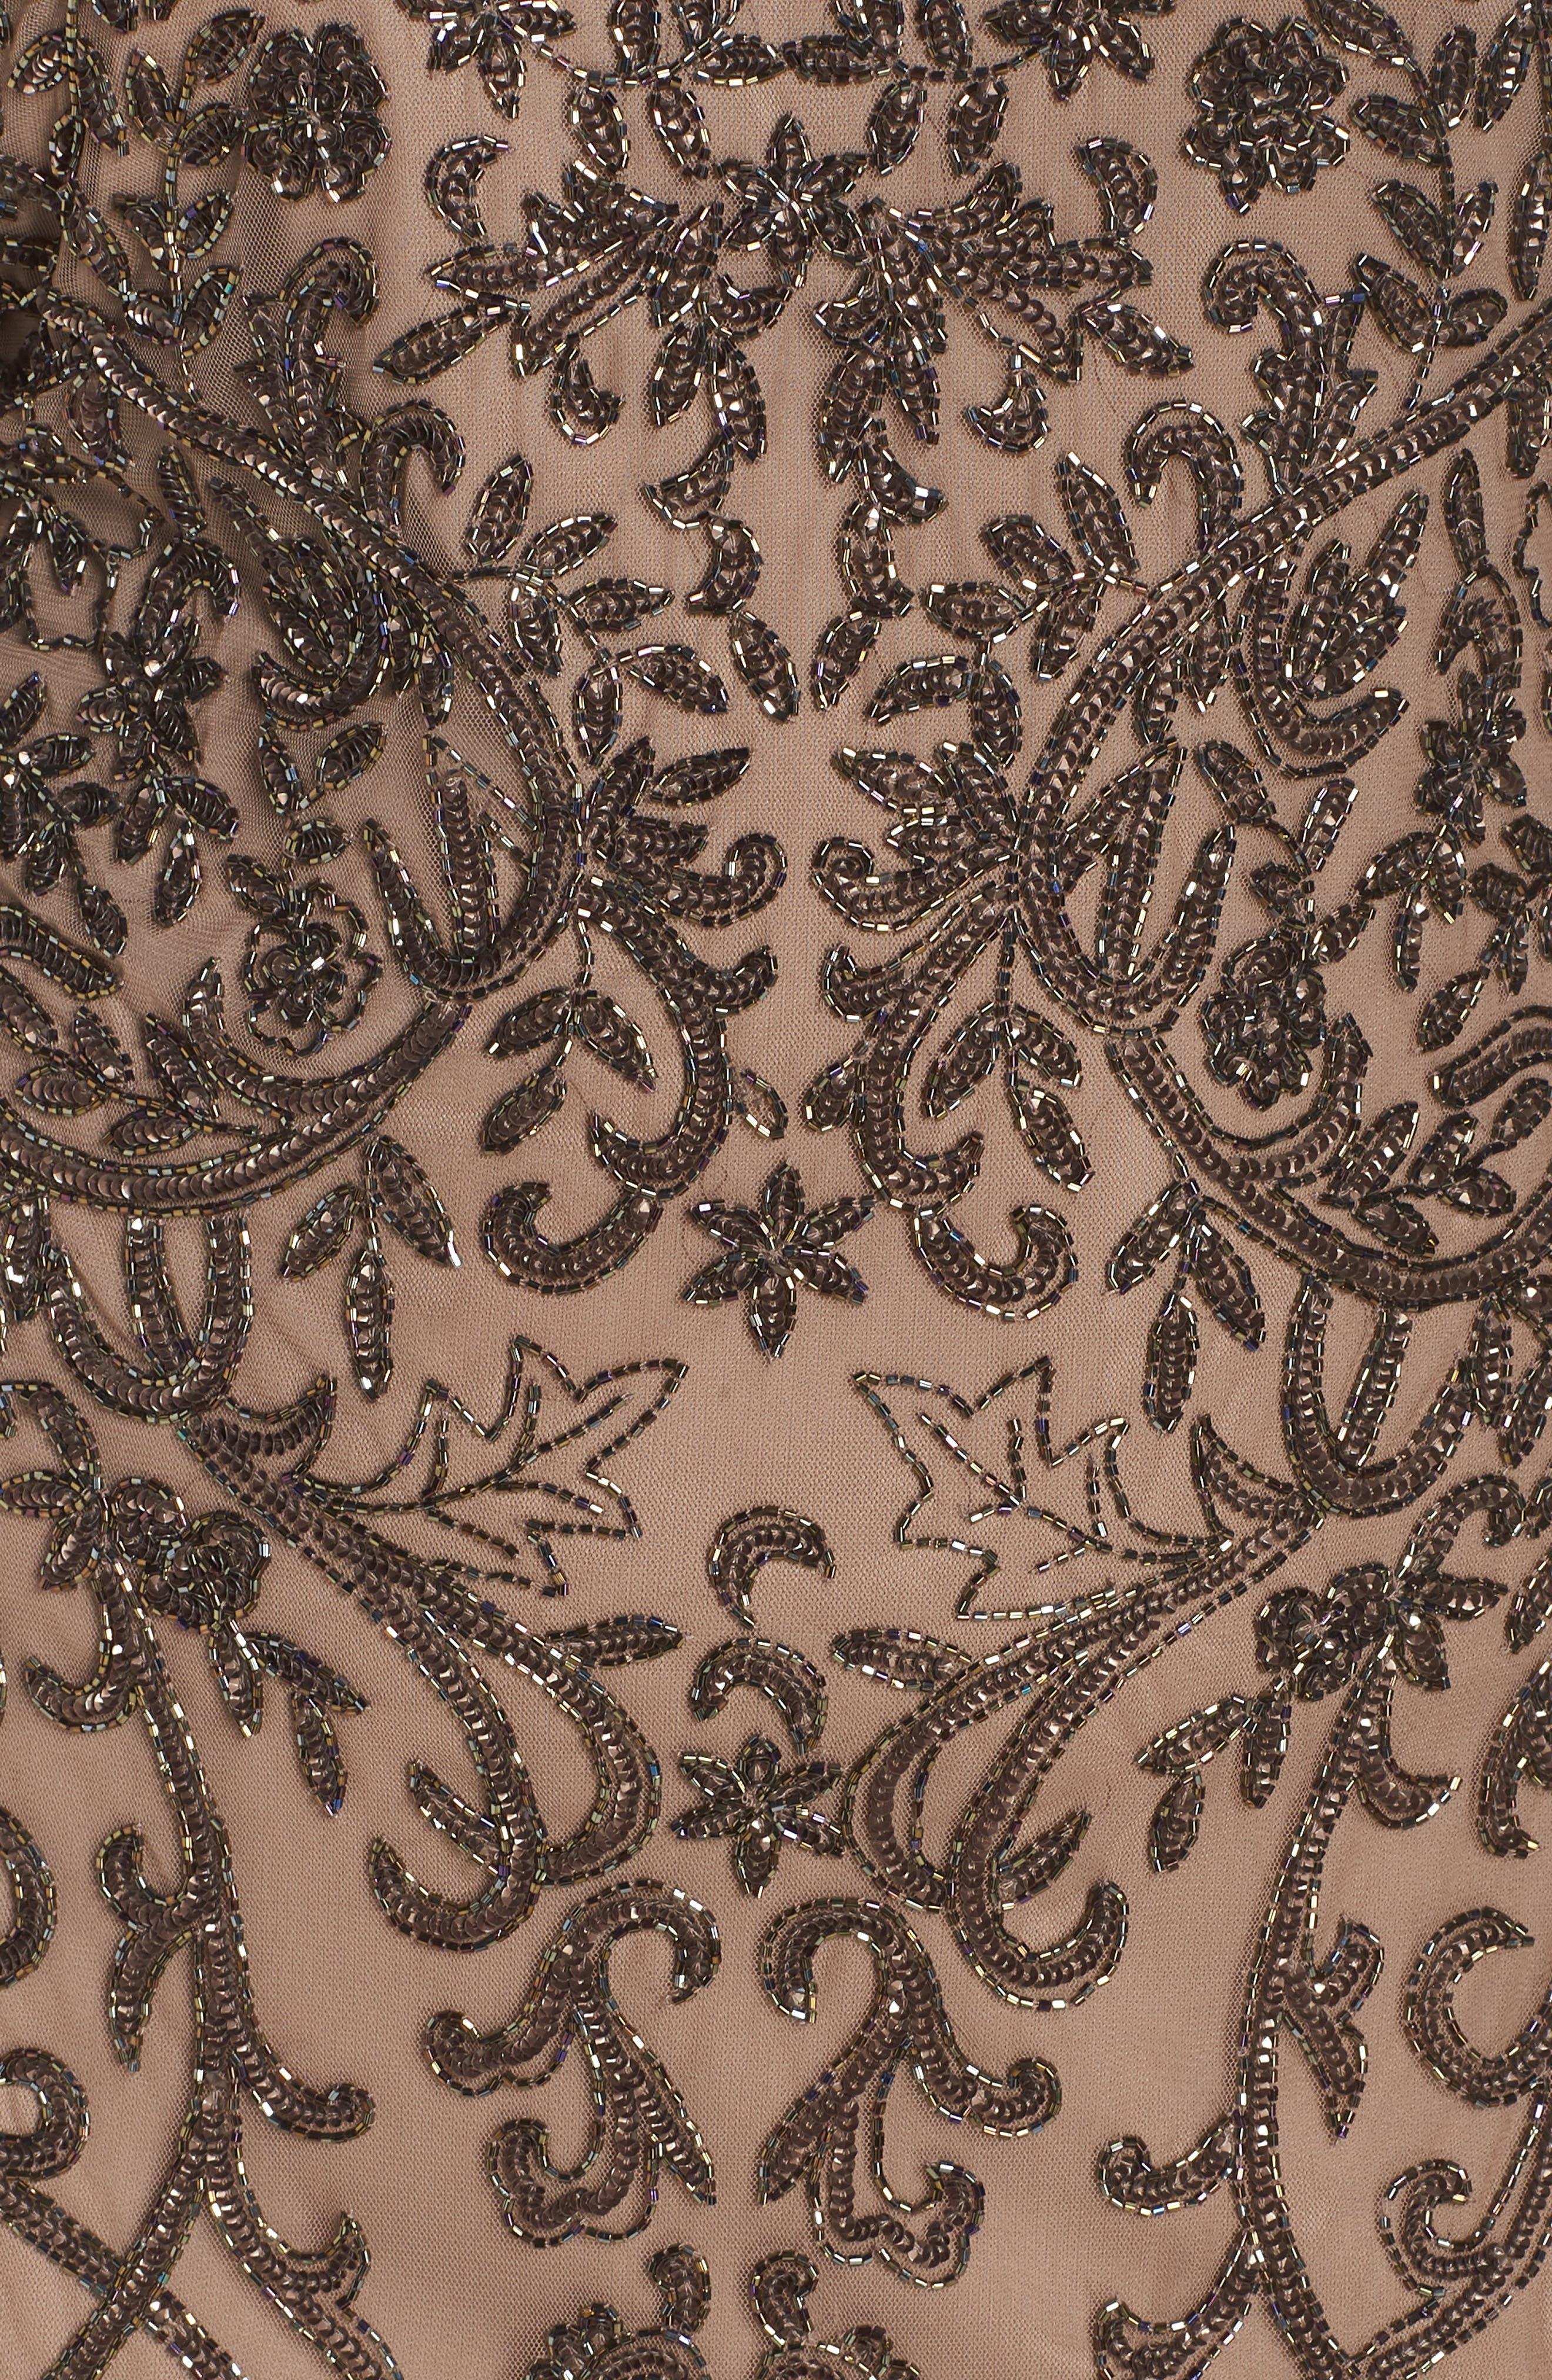 Embellished Mesh Sheath Dress,                             Alternate thumbnail 12, color,                             MOCHA